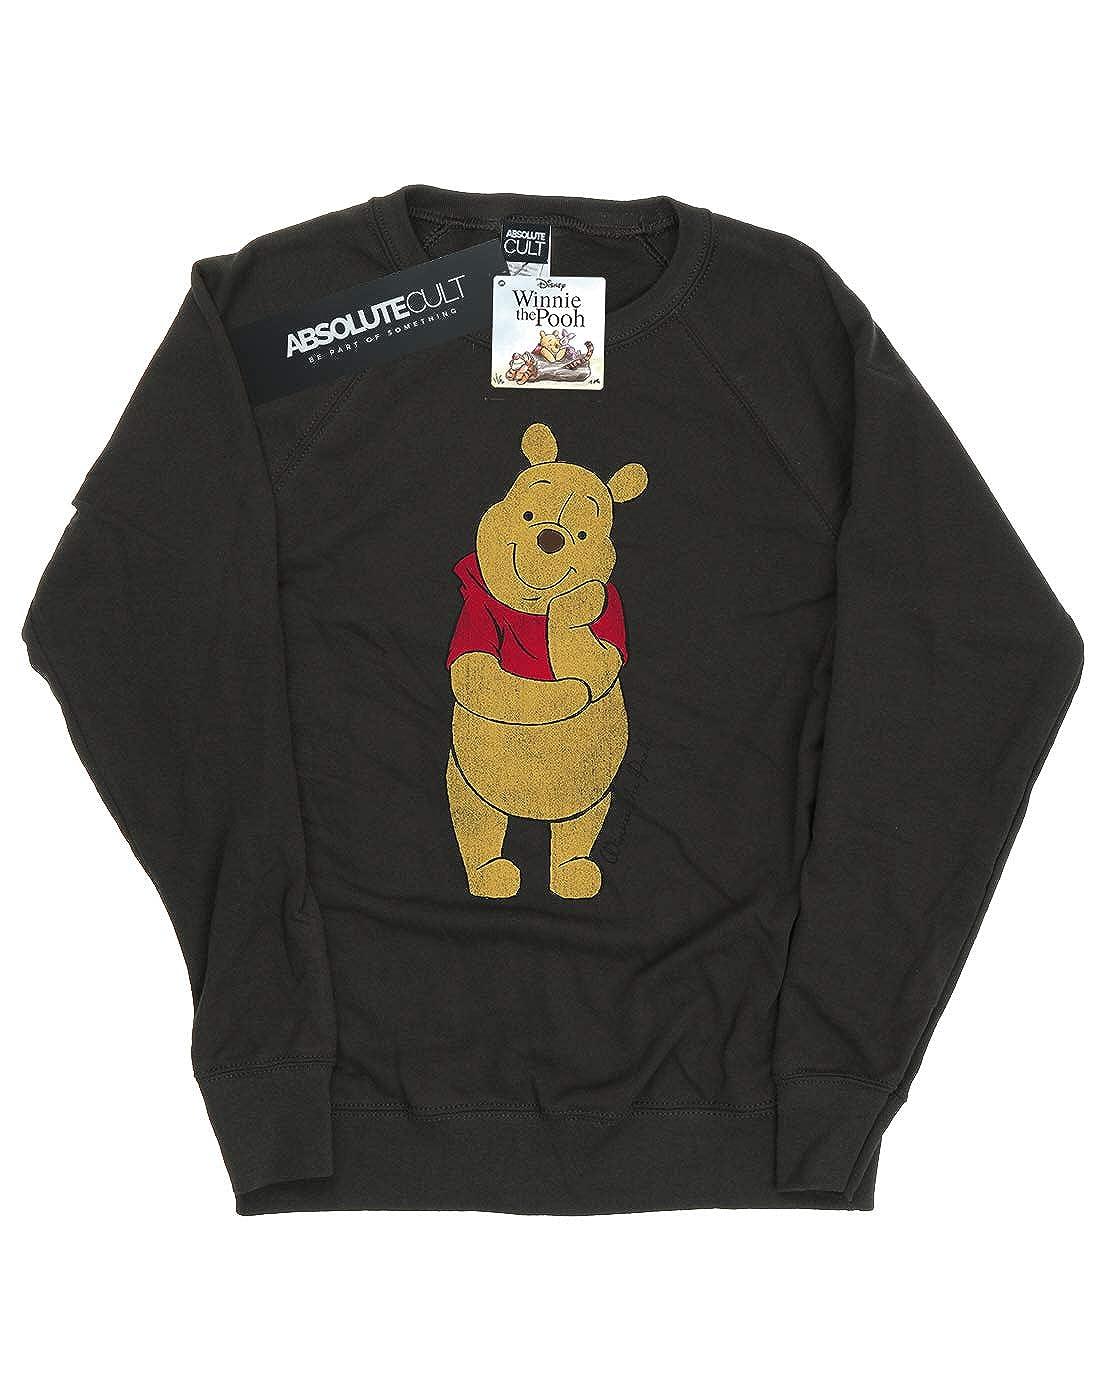 332e7b8c3873 Amazon.com  Disney Women s Classic Winnie The Pooh Sweatshirt  Clothing